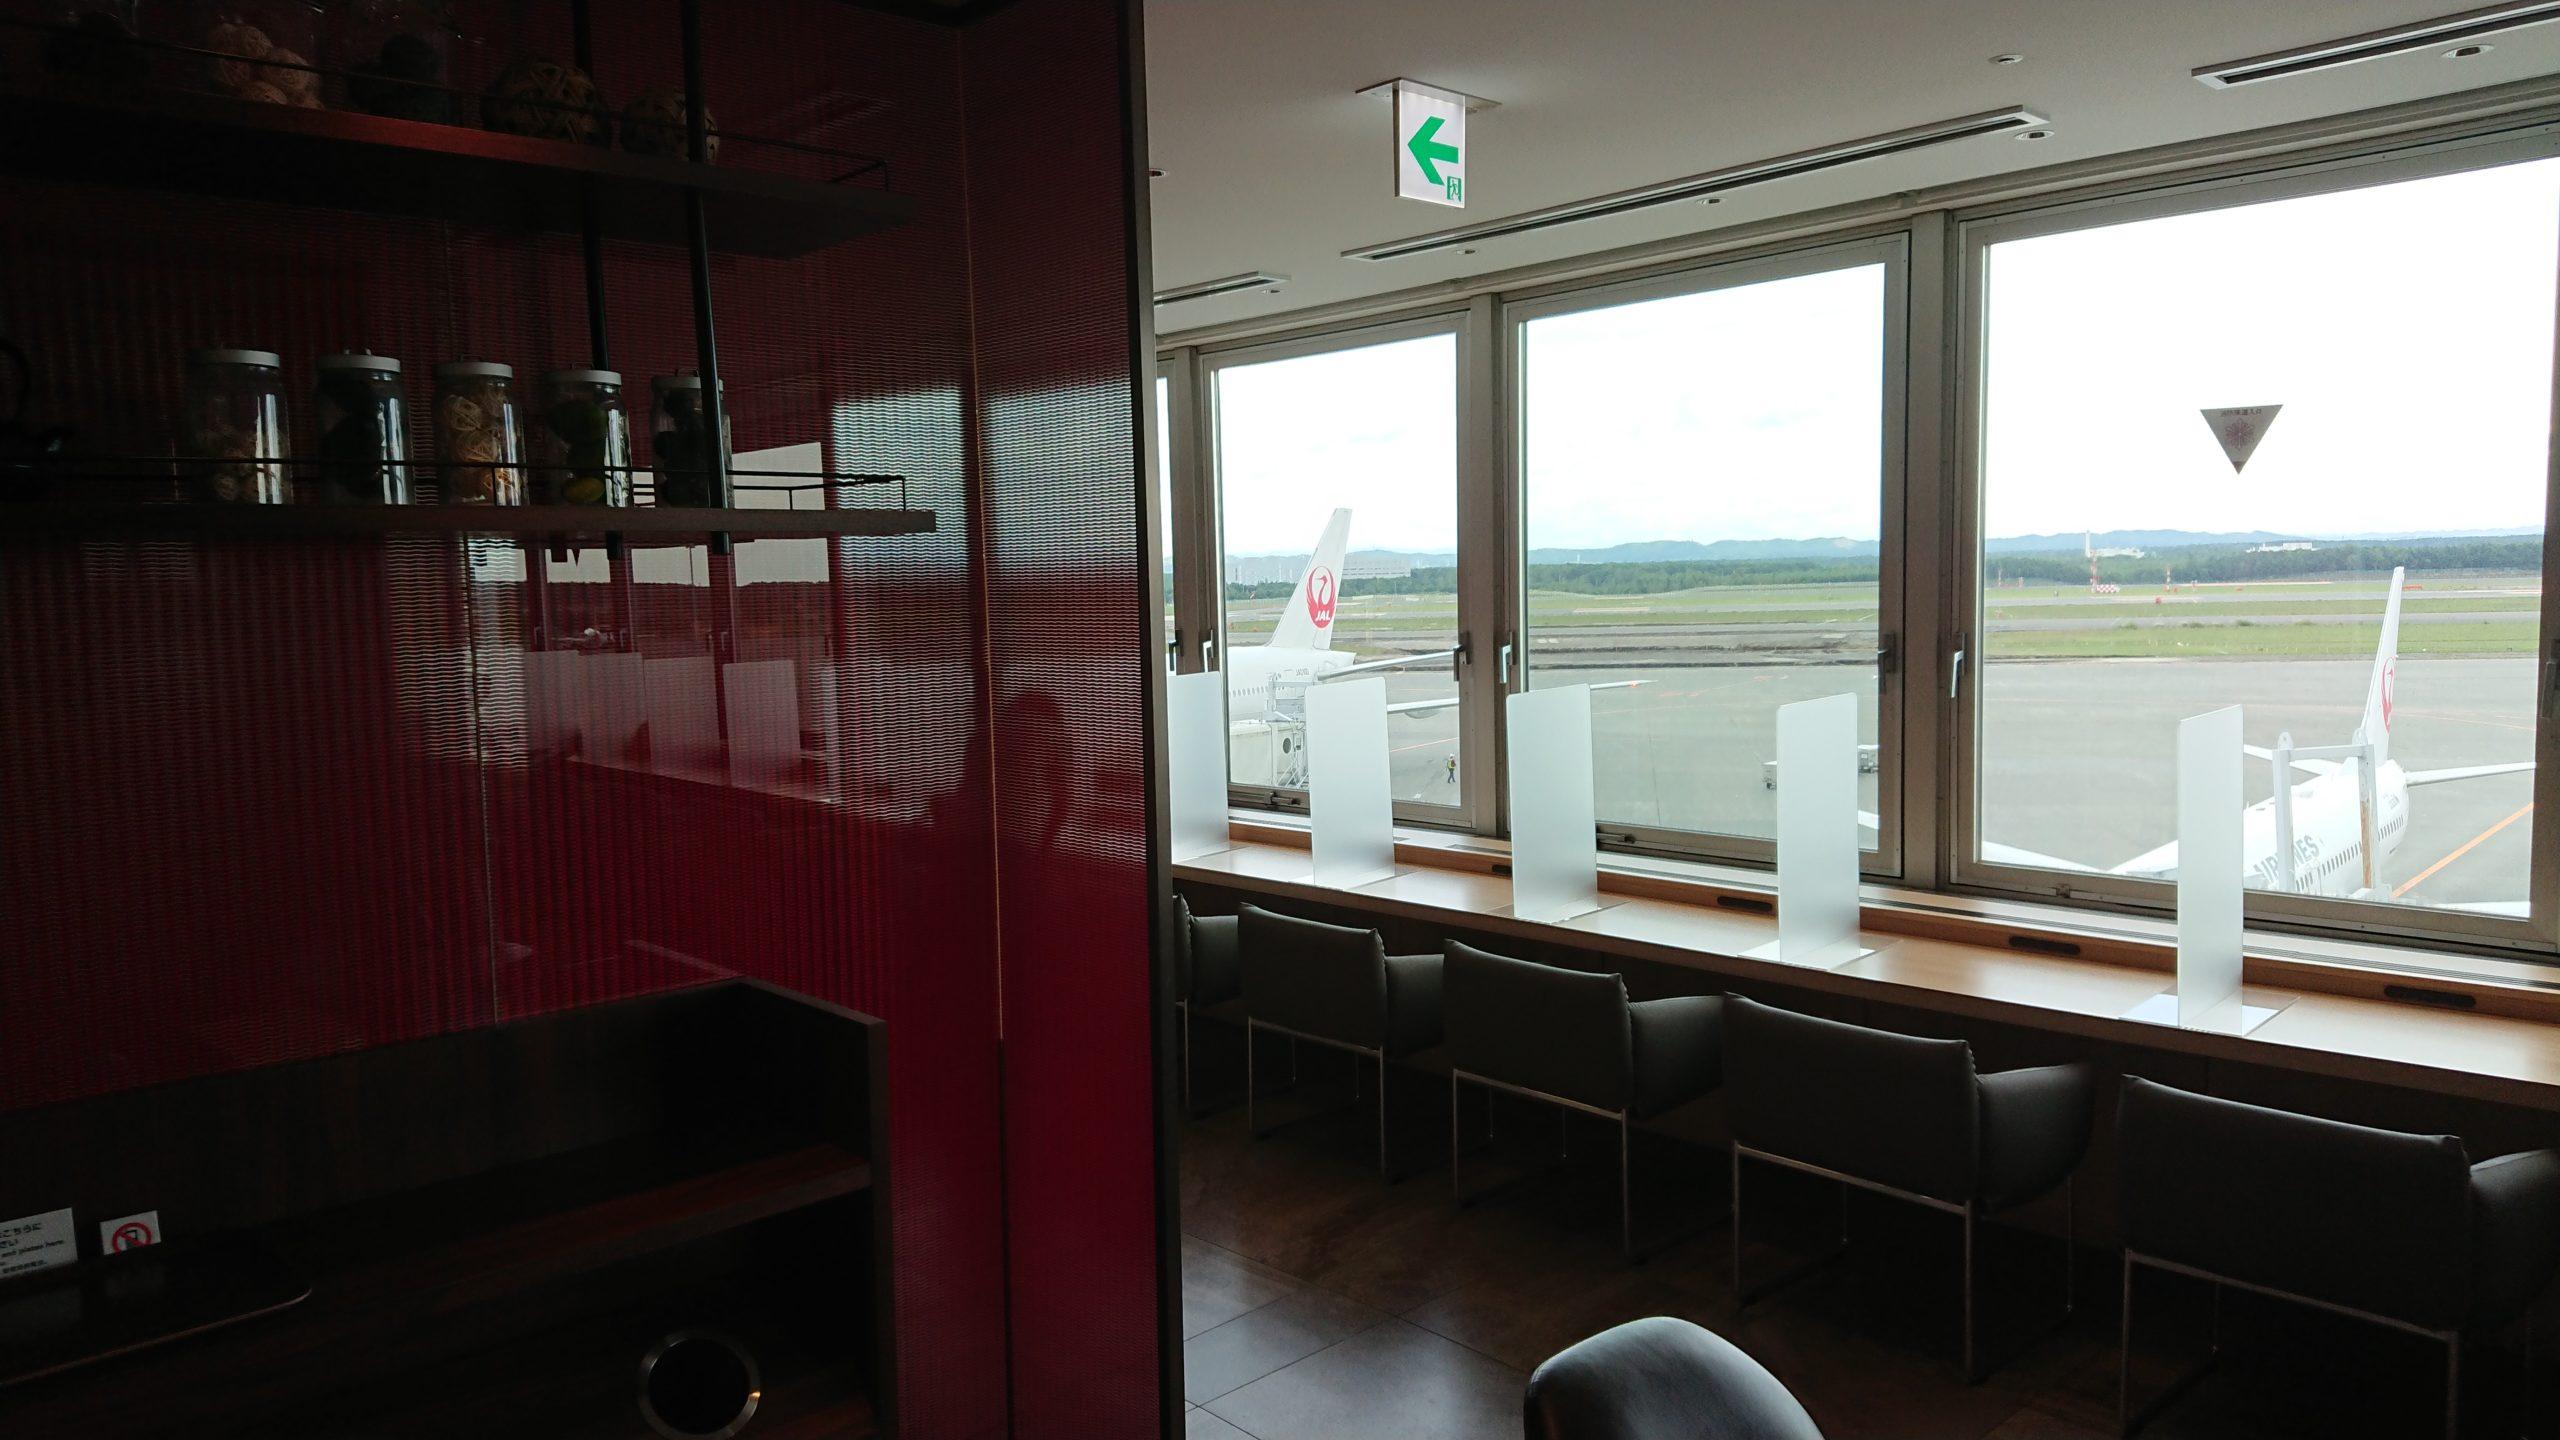 札幌・新千歳国際空港 JAL DIAMOND PREMIER LOUNGE 20年09月訪問